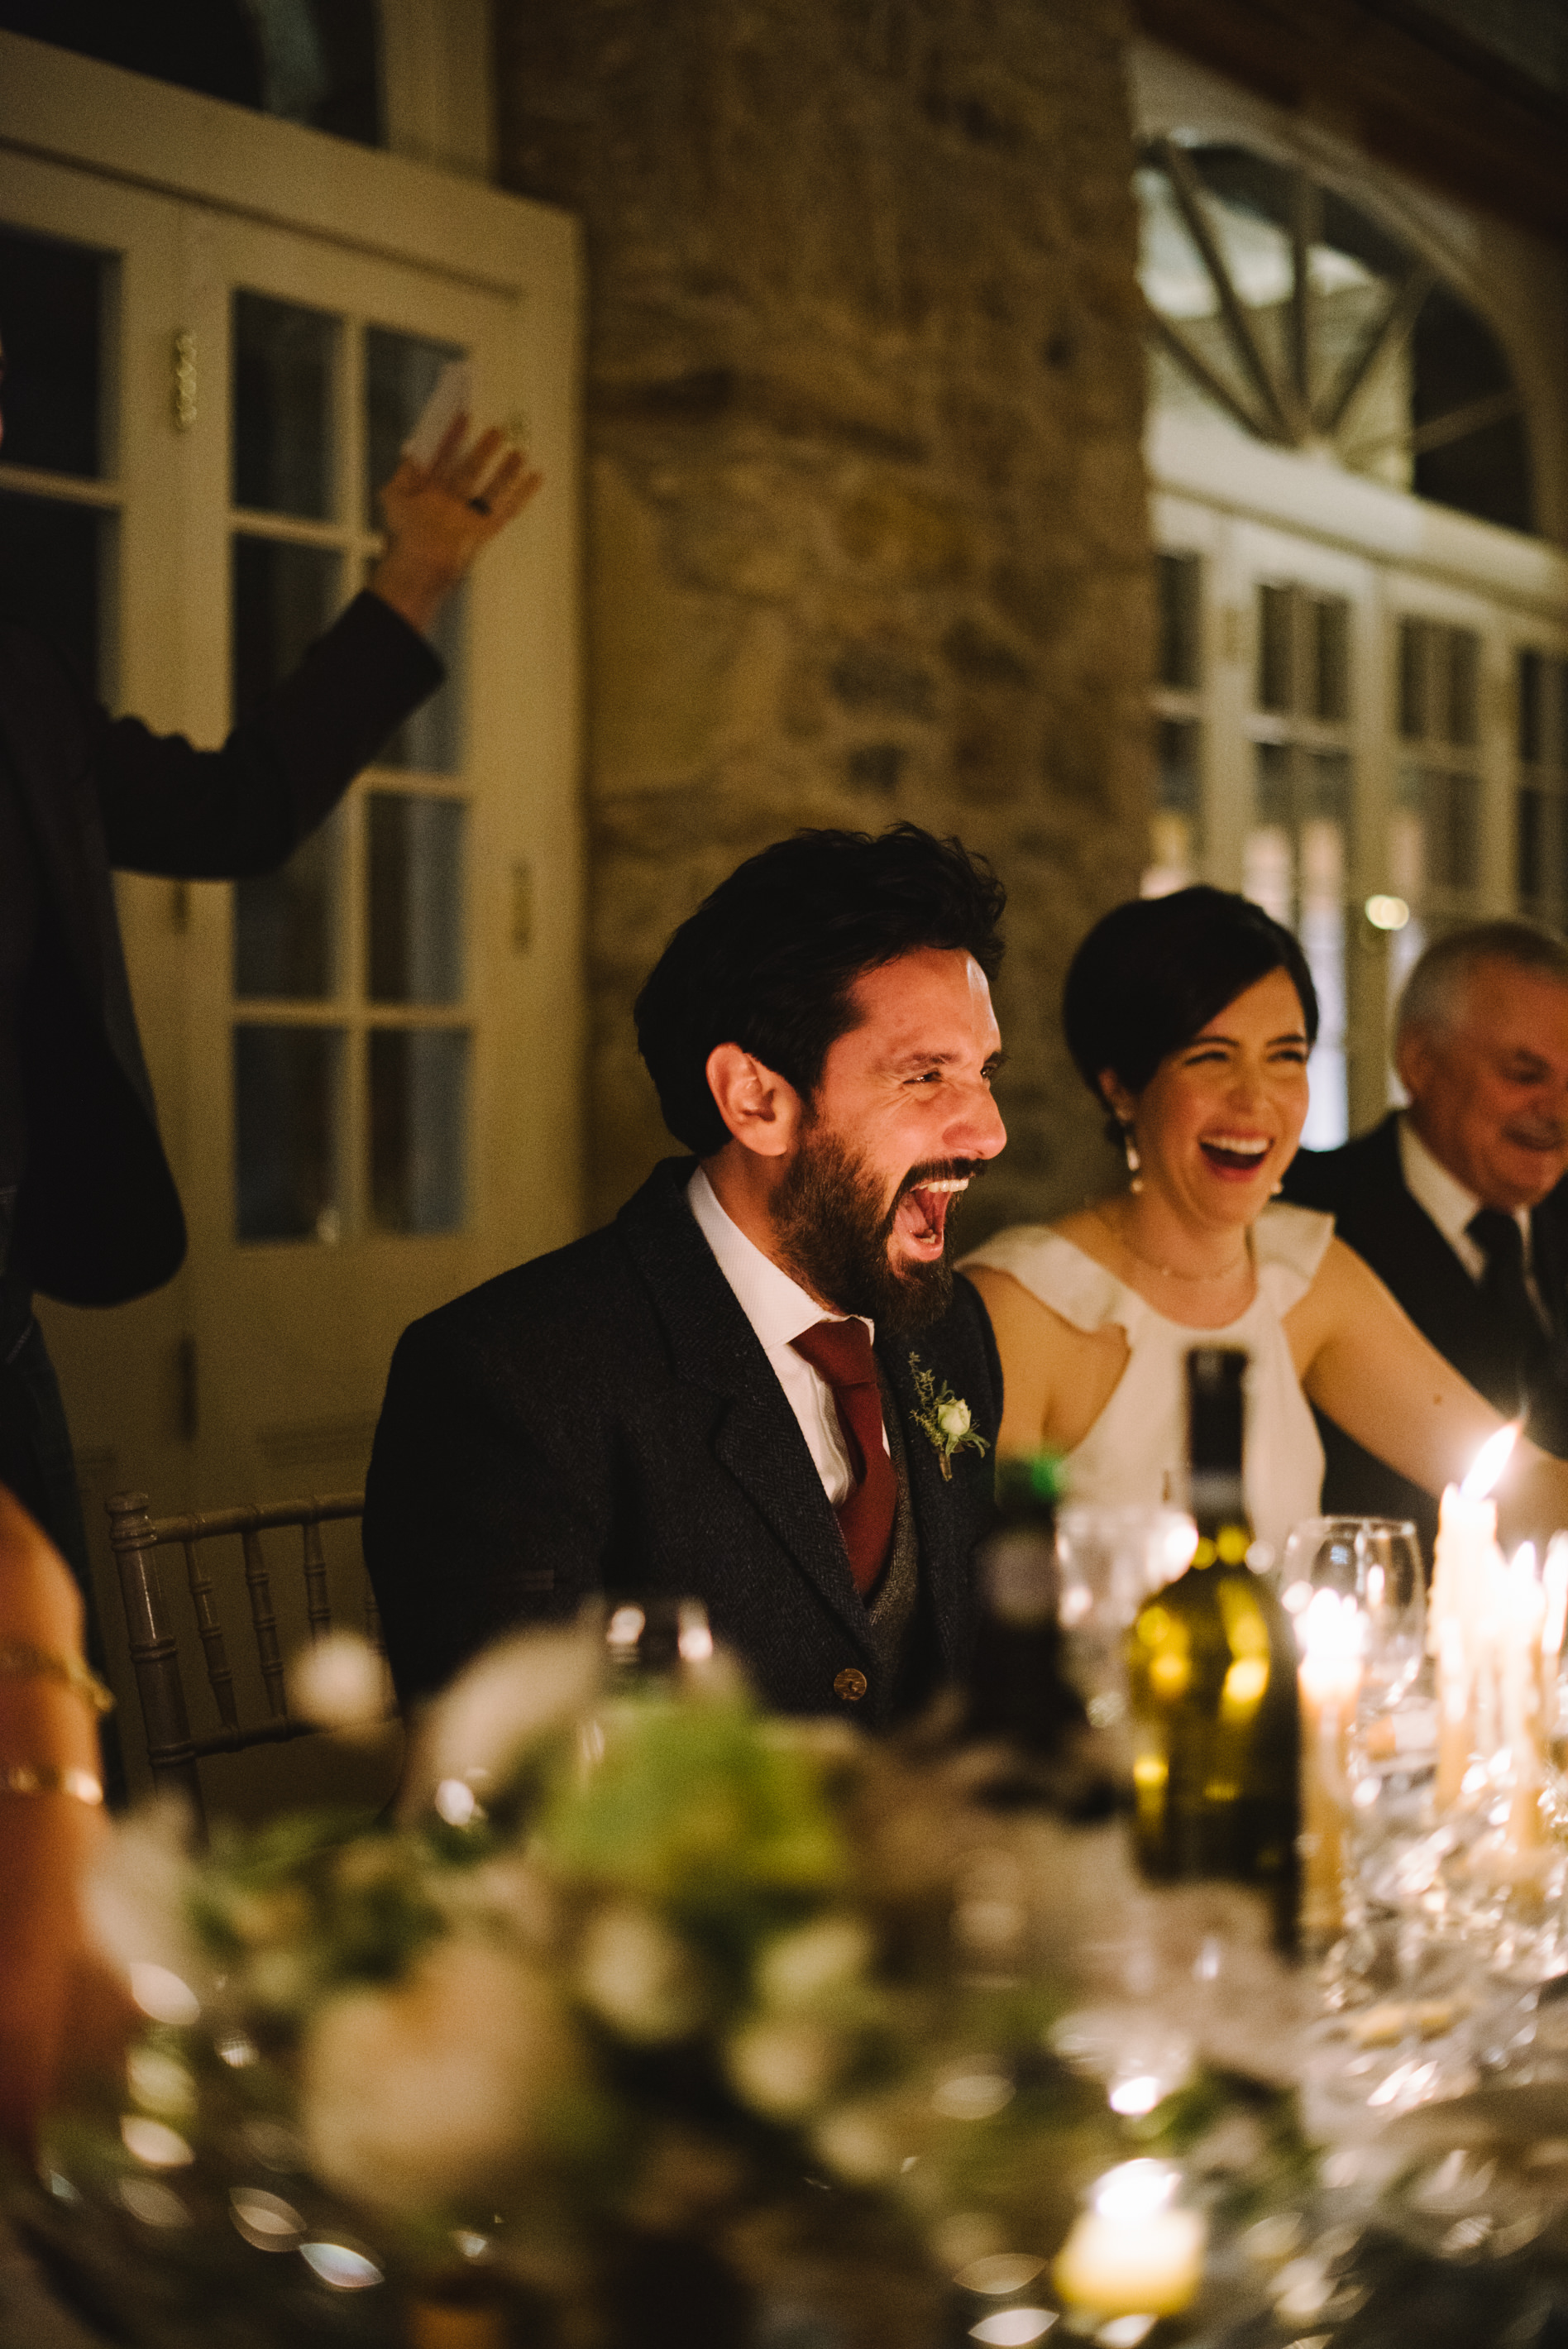 0247-LISA-DEVINE-PHOTOGRAPHY-ALTERNATIVE-WEDDING-PHOTOGRAPHY-SCOTLAND-DESTINATION-WEDDINGS-GLASGOW-WEDDINGS-COOL-WEDDINGS-STYLISH-WEDDINGS.JPG